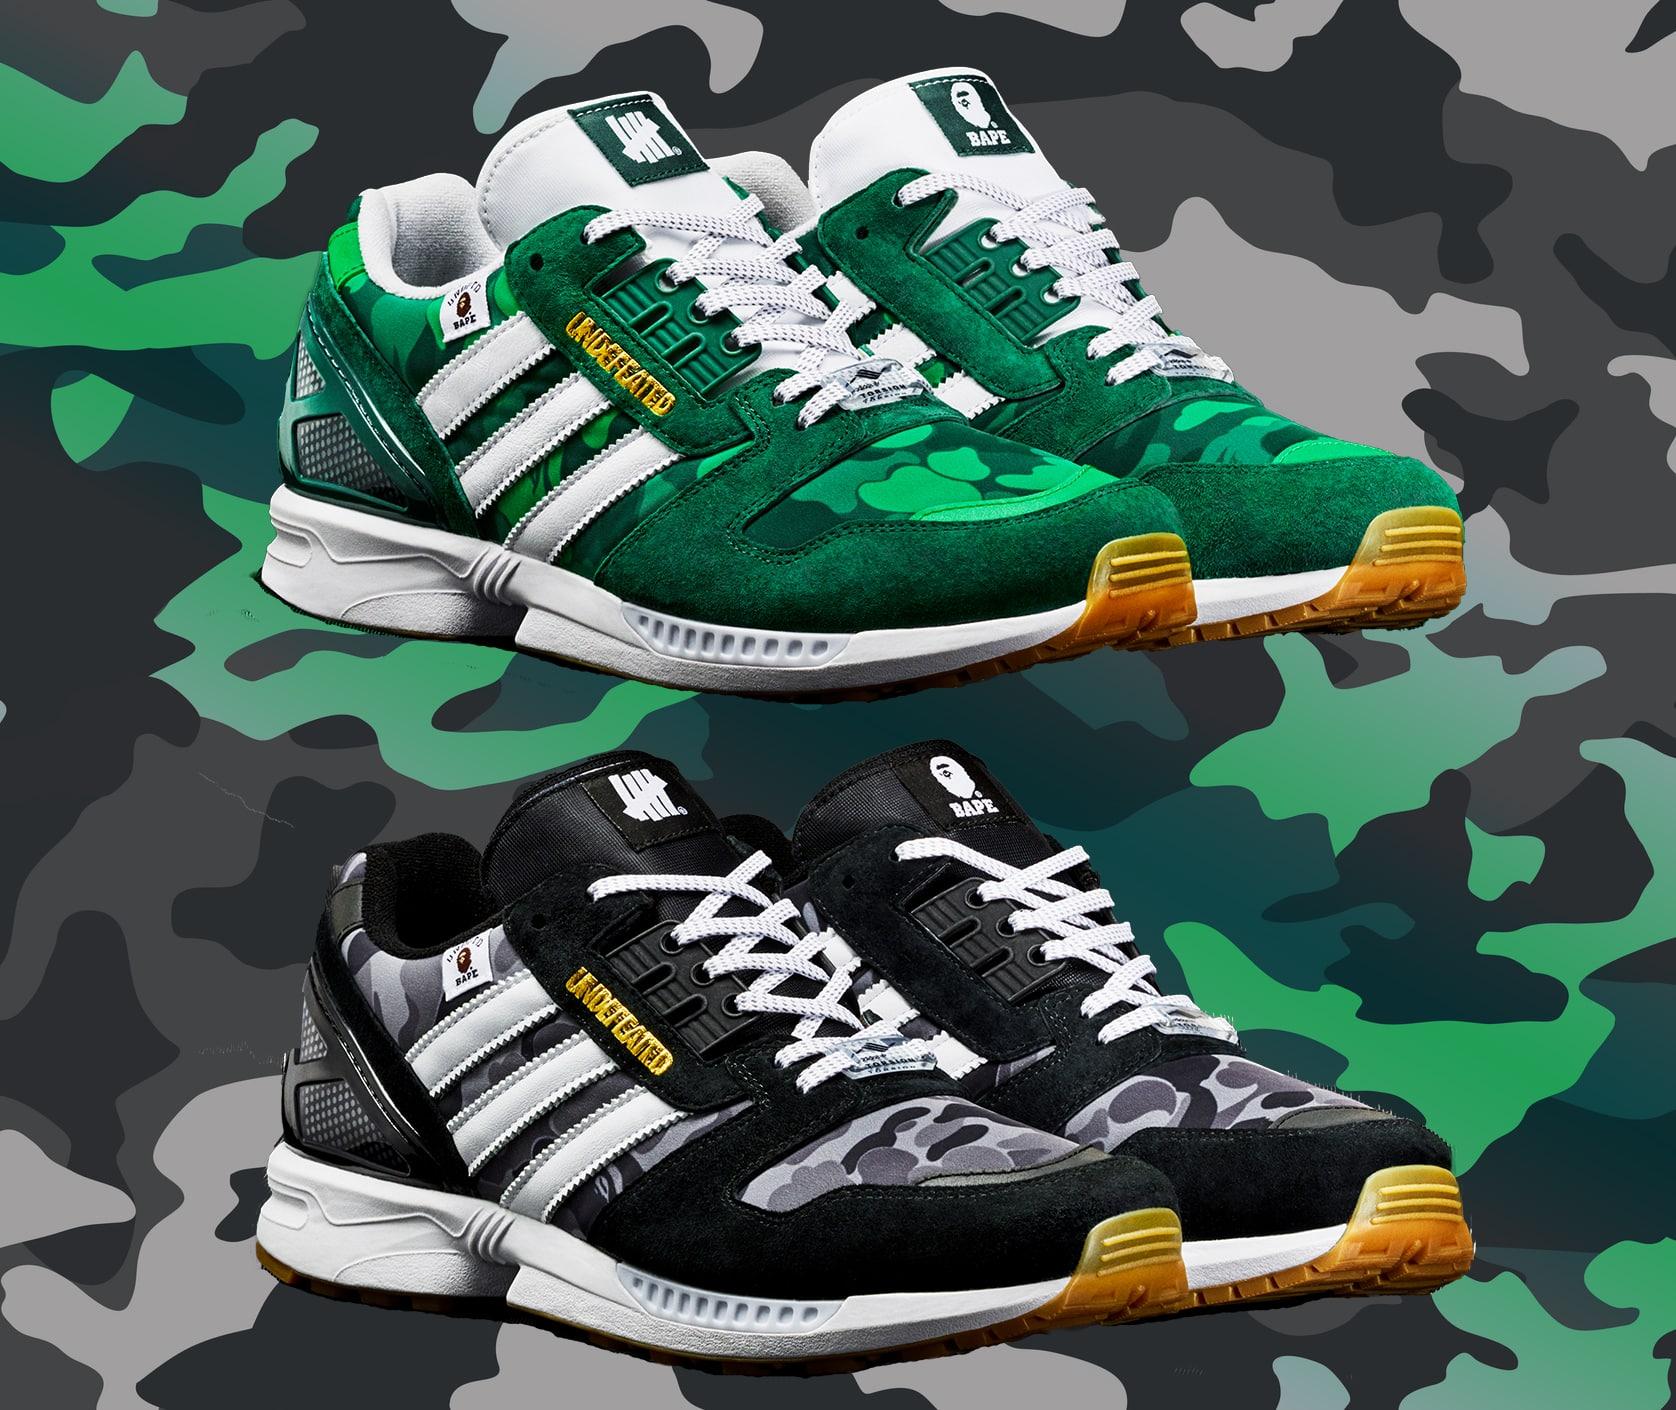 adidas zx8000 bape x undefeated x adidas collab